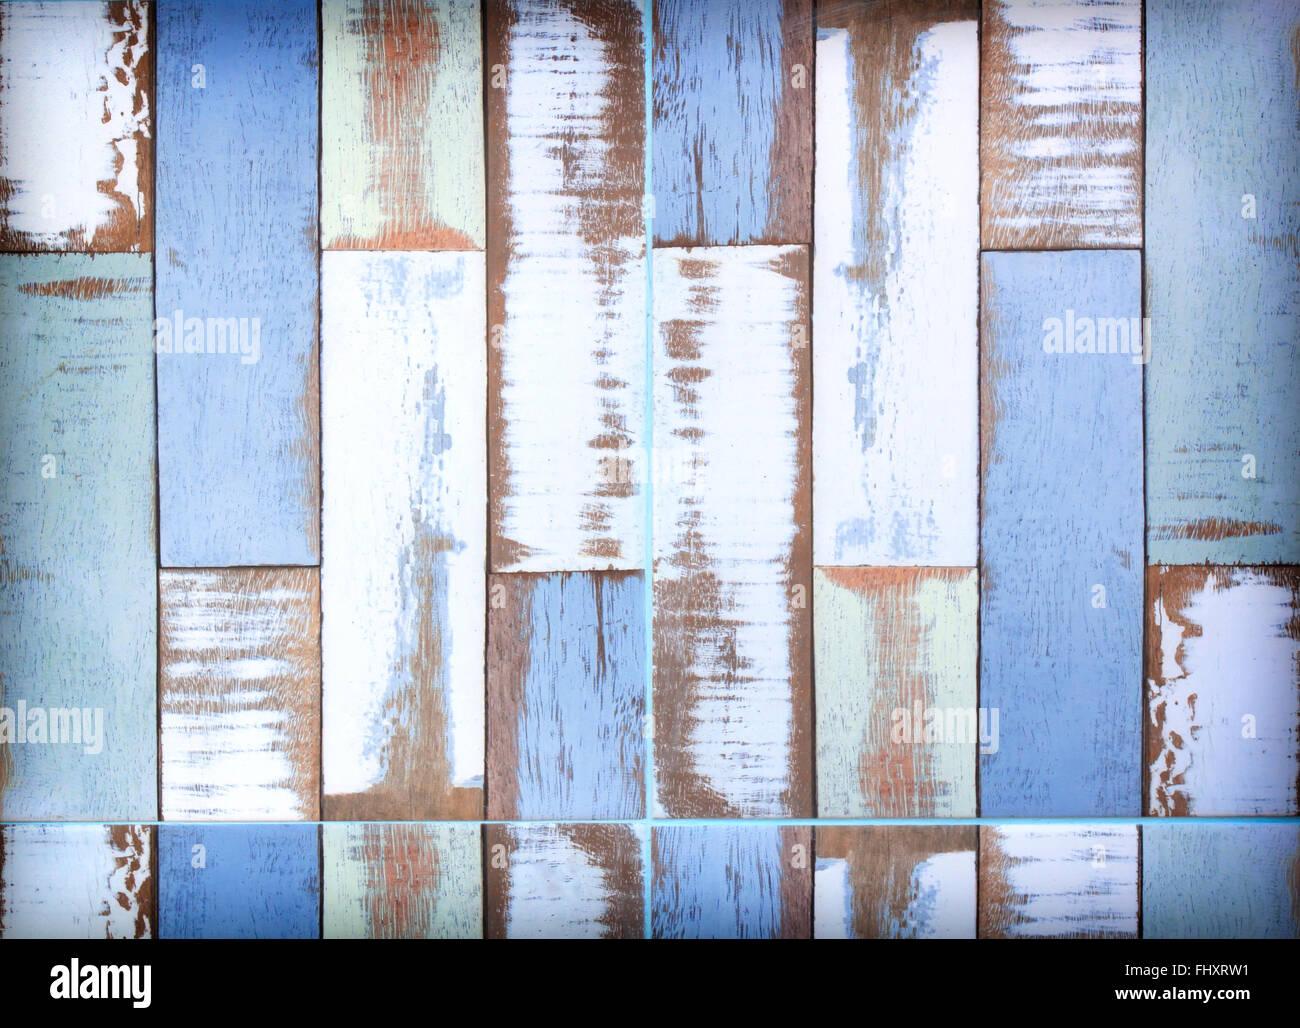 Tiles wooden parquet flooring. Horizontal wooden background. - Stock Image